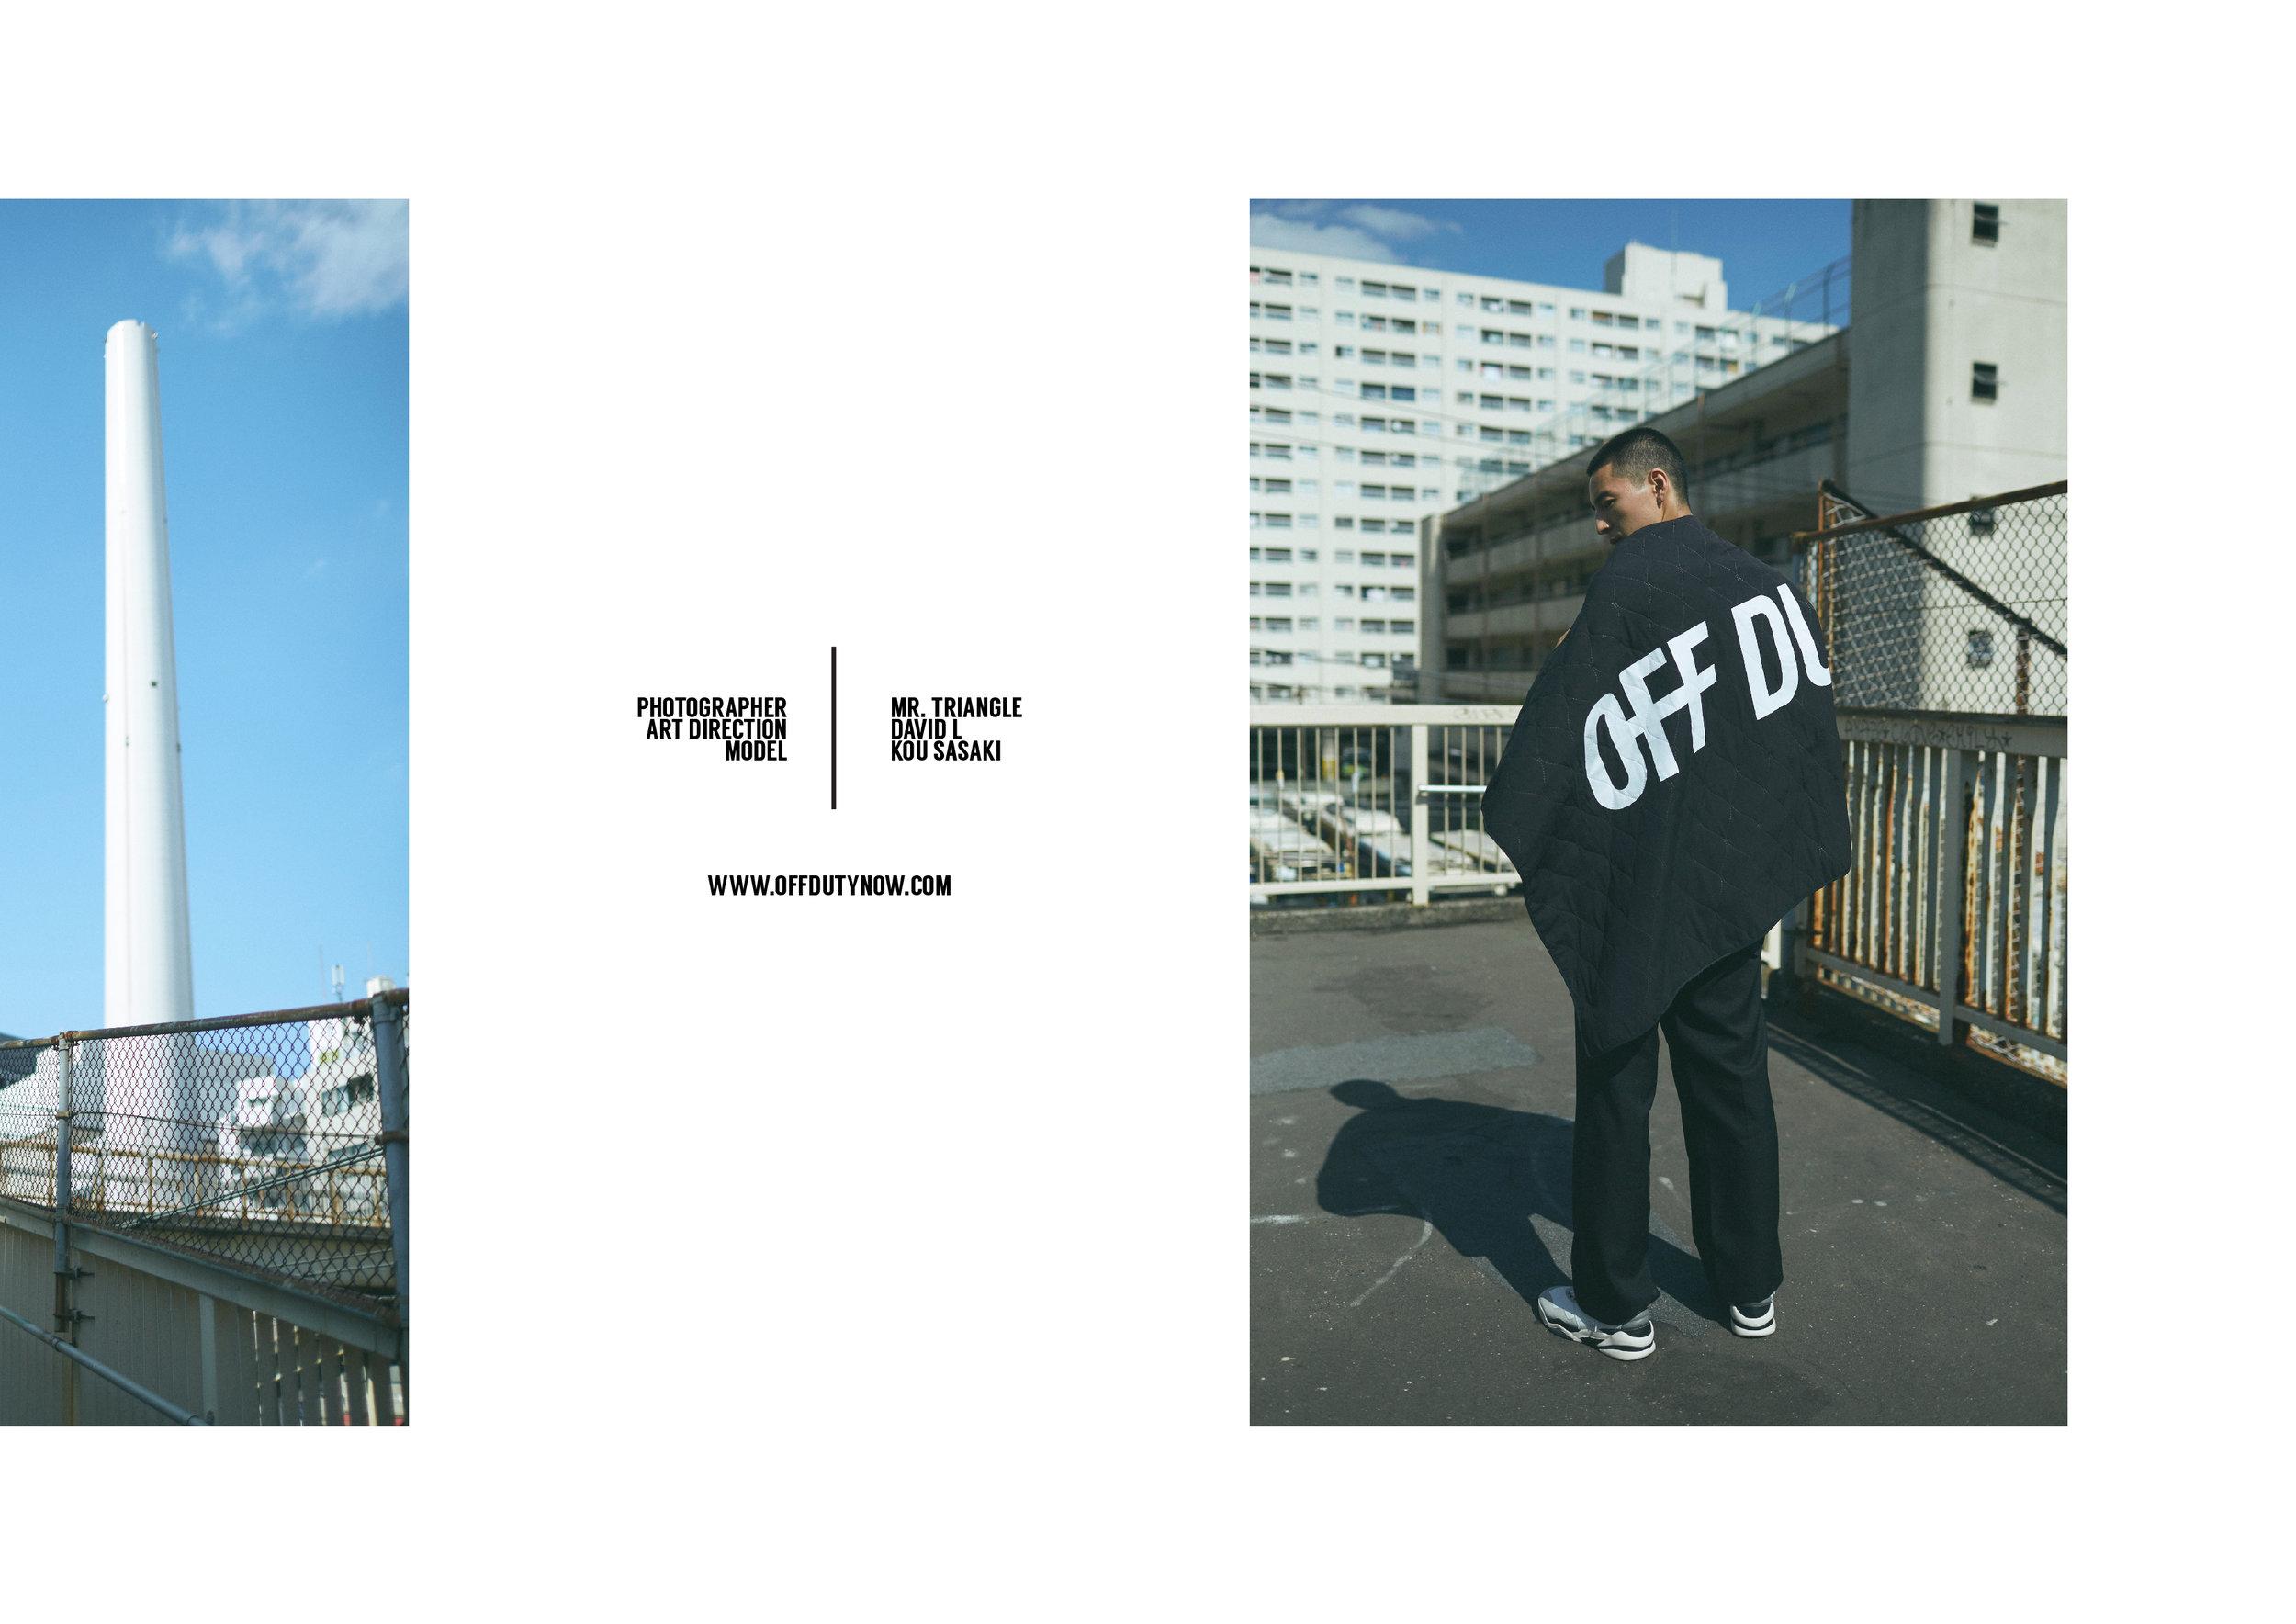 offduty_fw18lookbook-36.jpg